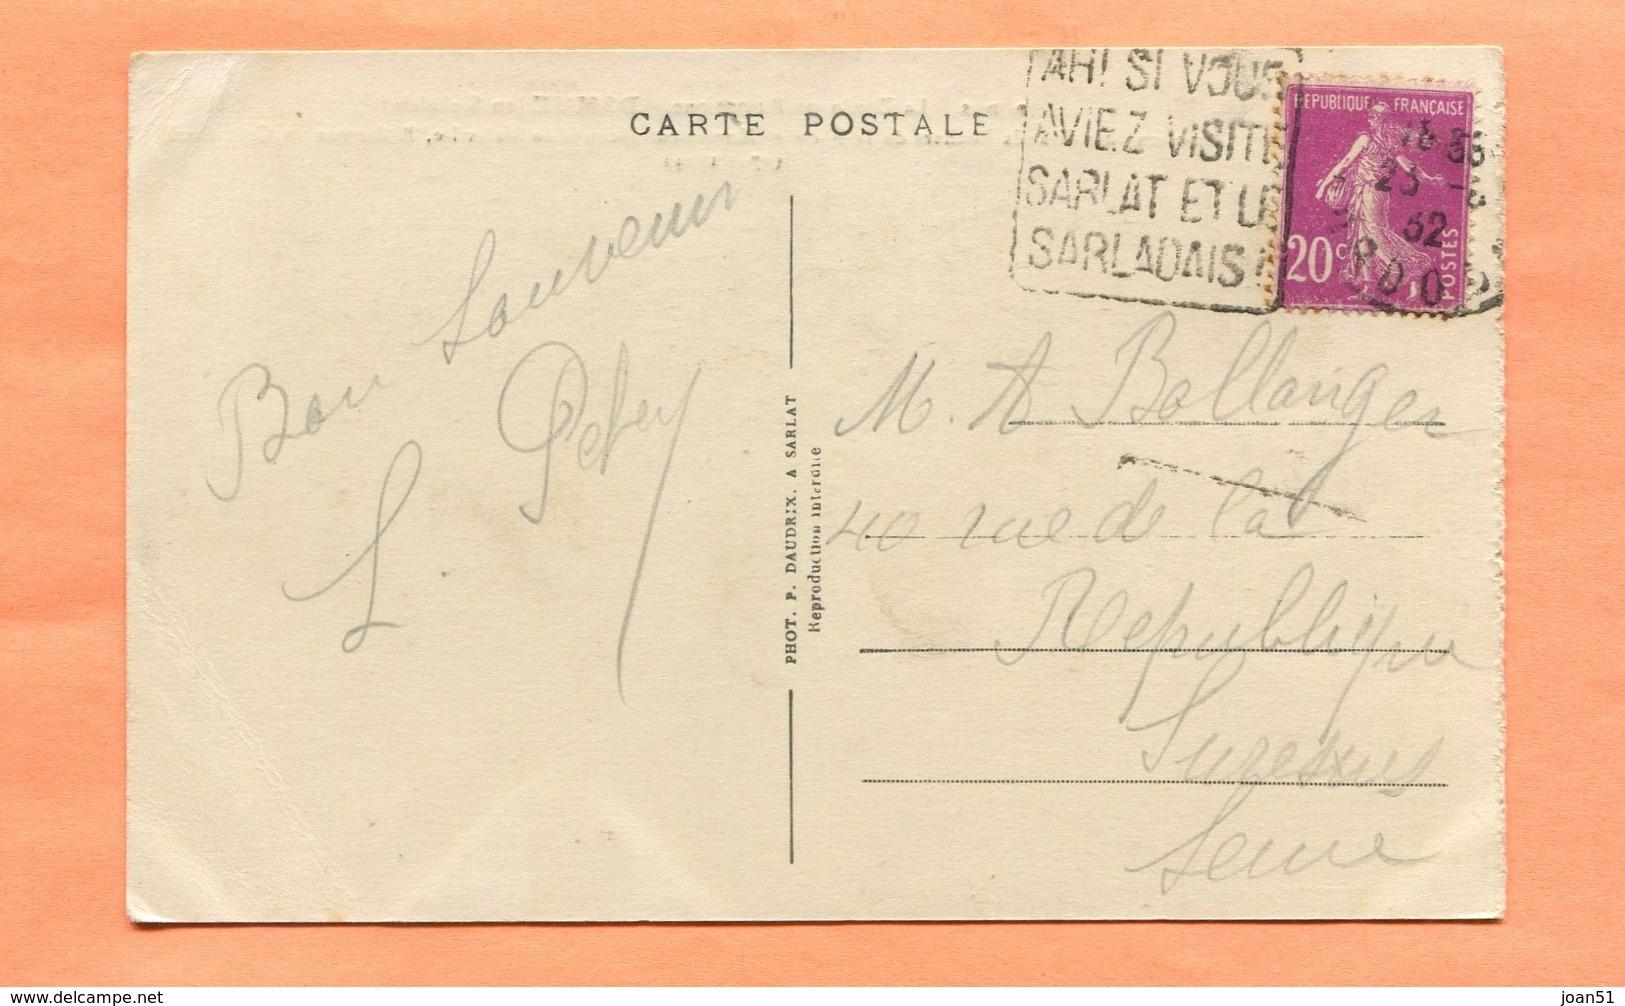 M2  DAGUIN  TEXTE A GAUCHE  SARLAT SUR SEMEUSE LILAS 20 C 1932 - Postmark Collection (Covers)